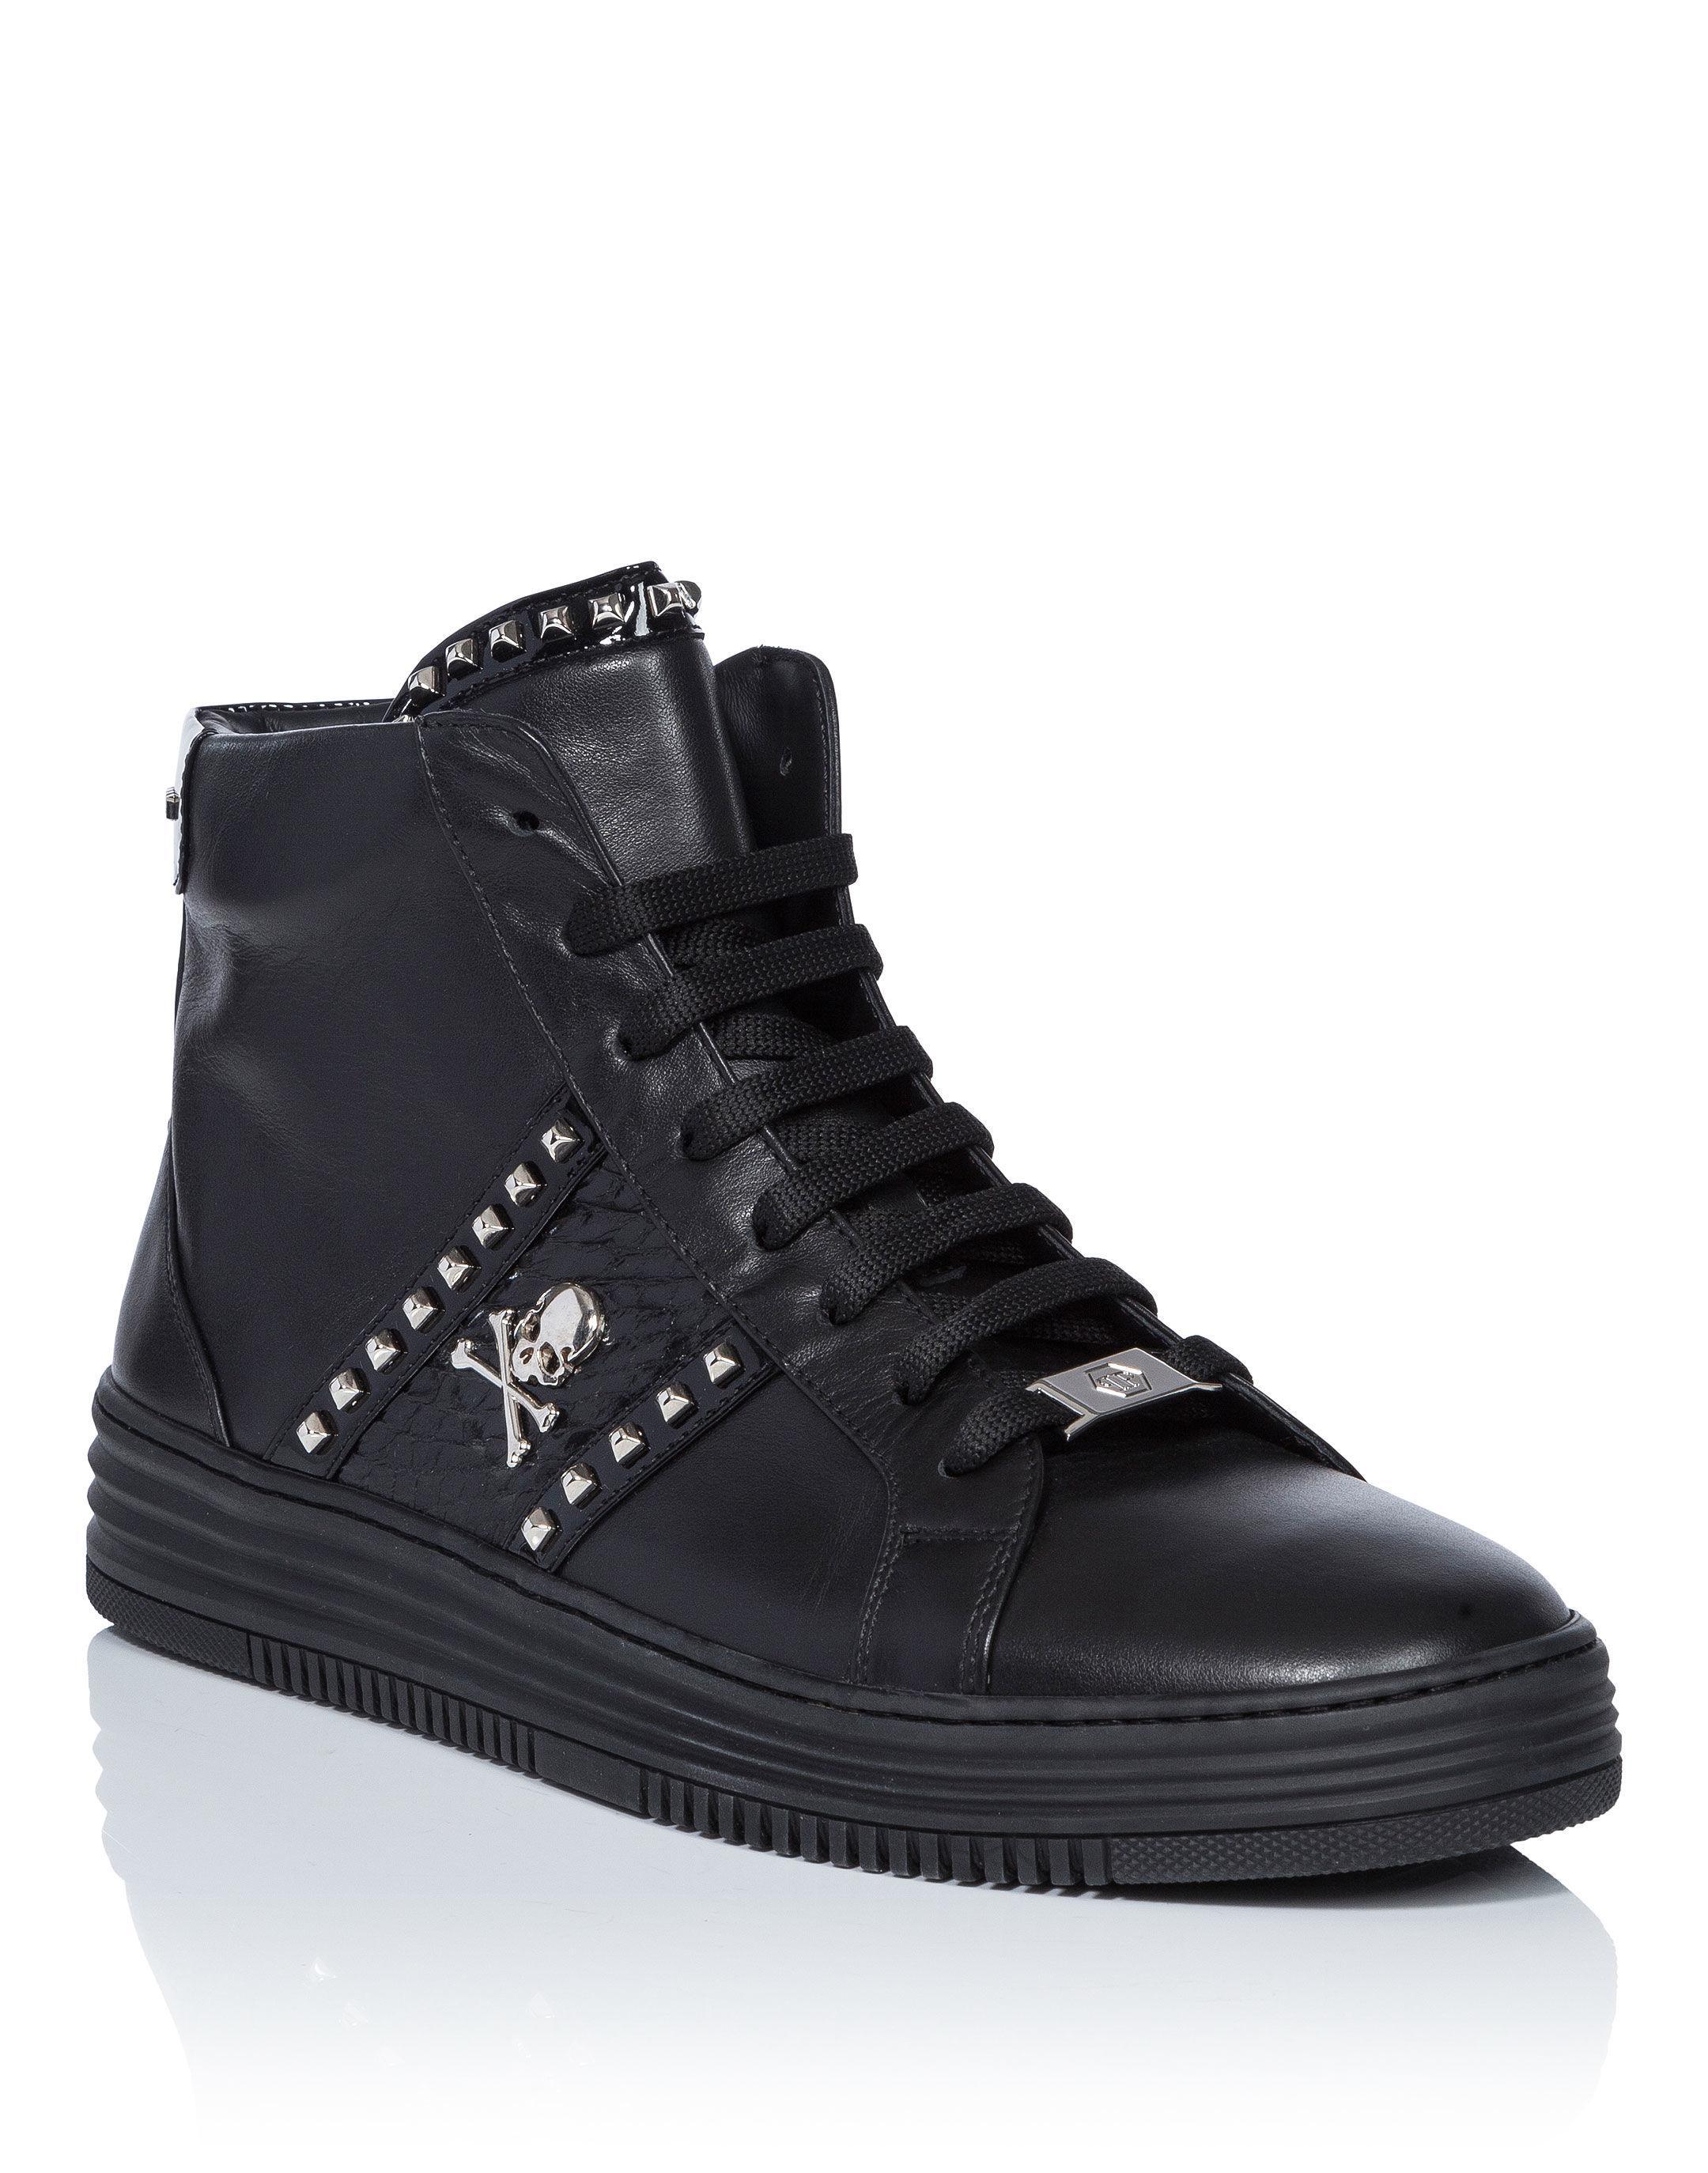 Vancouver hi-top sneakers - Black Philipp Plein 3g8c6LRubv